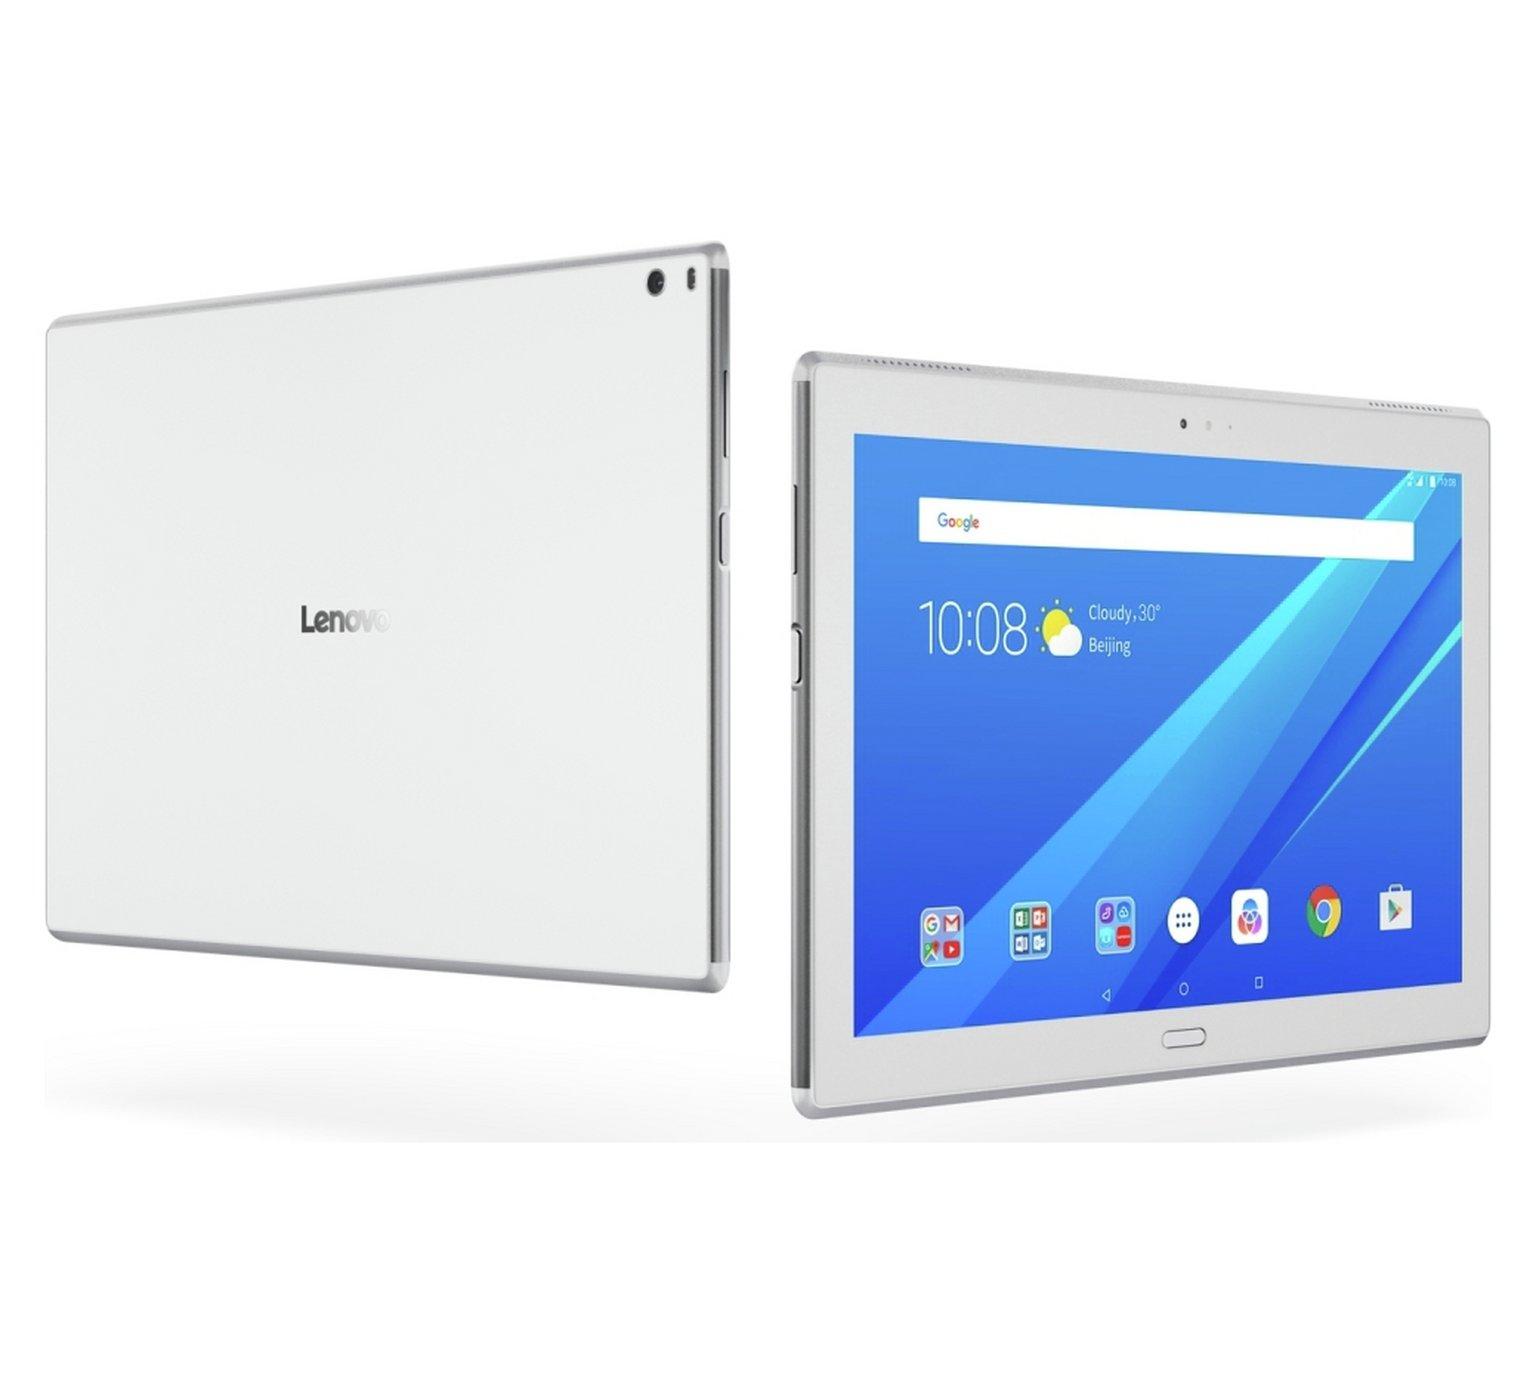 Lenovo Tab 4 10 *Plus* FHD 1920x1280 IPS 3GB Ram Snapdragon 625 64bit Octa-Core Android Nougat @Lenovo.com